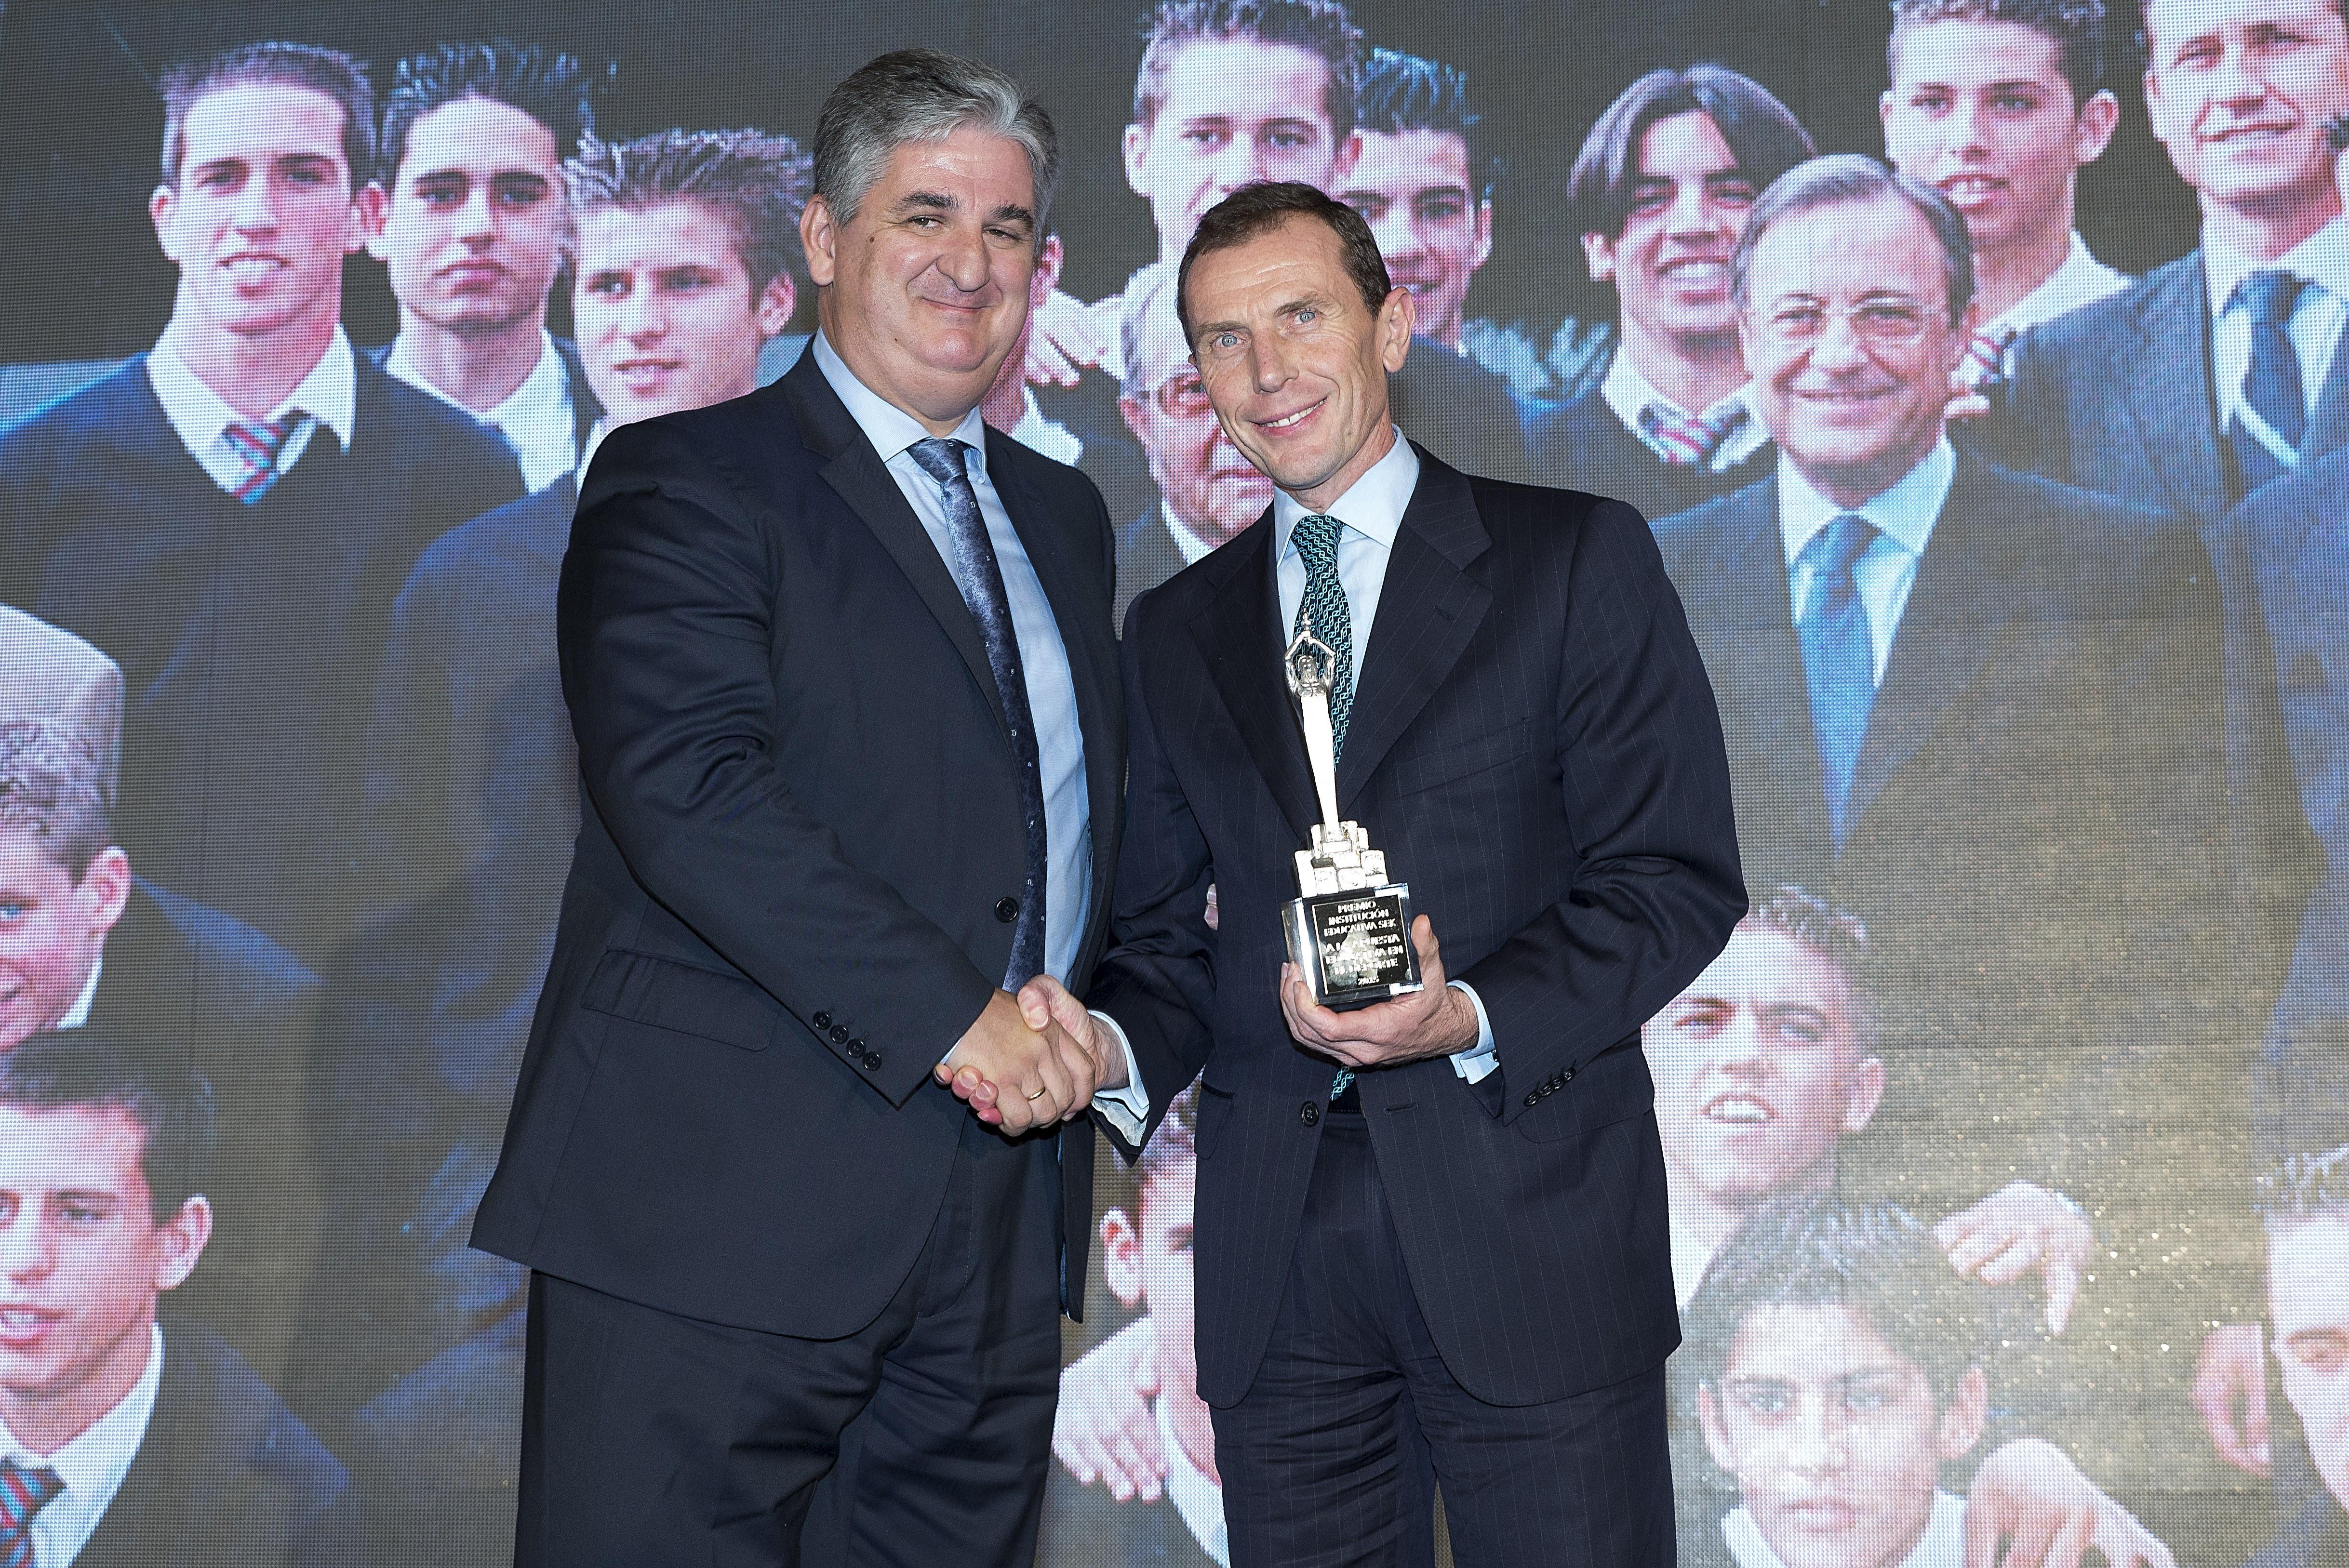 Fotografía Emilio Butragueño Jefe Relaciones Institucionales Real Madrid CF  © Jorge Zorrilla Fotógr